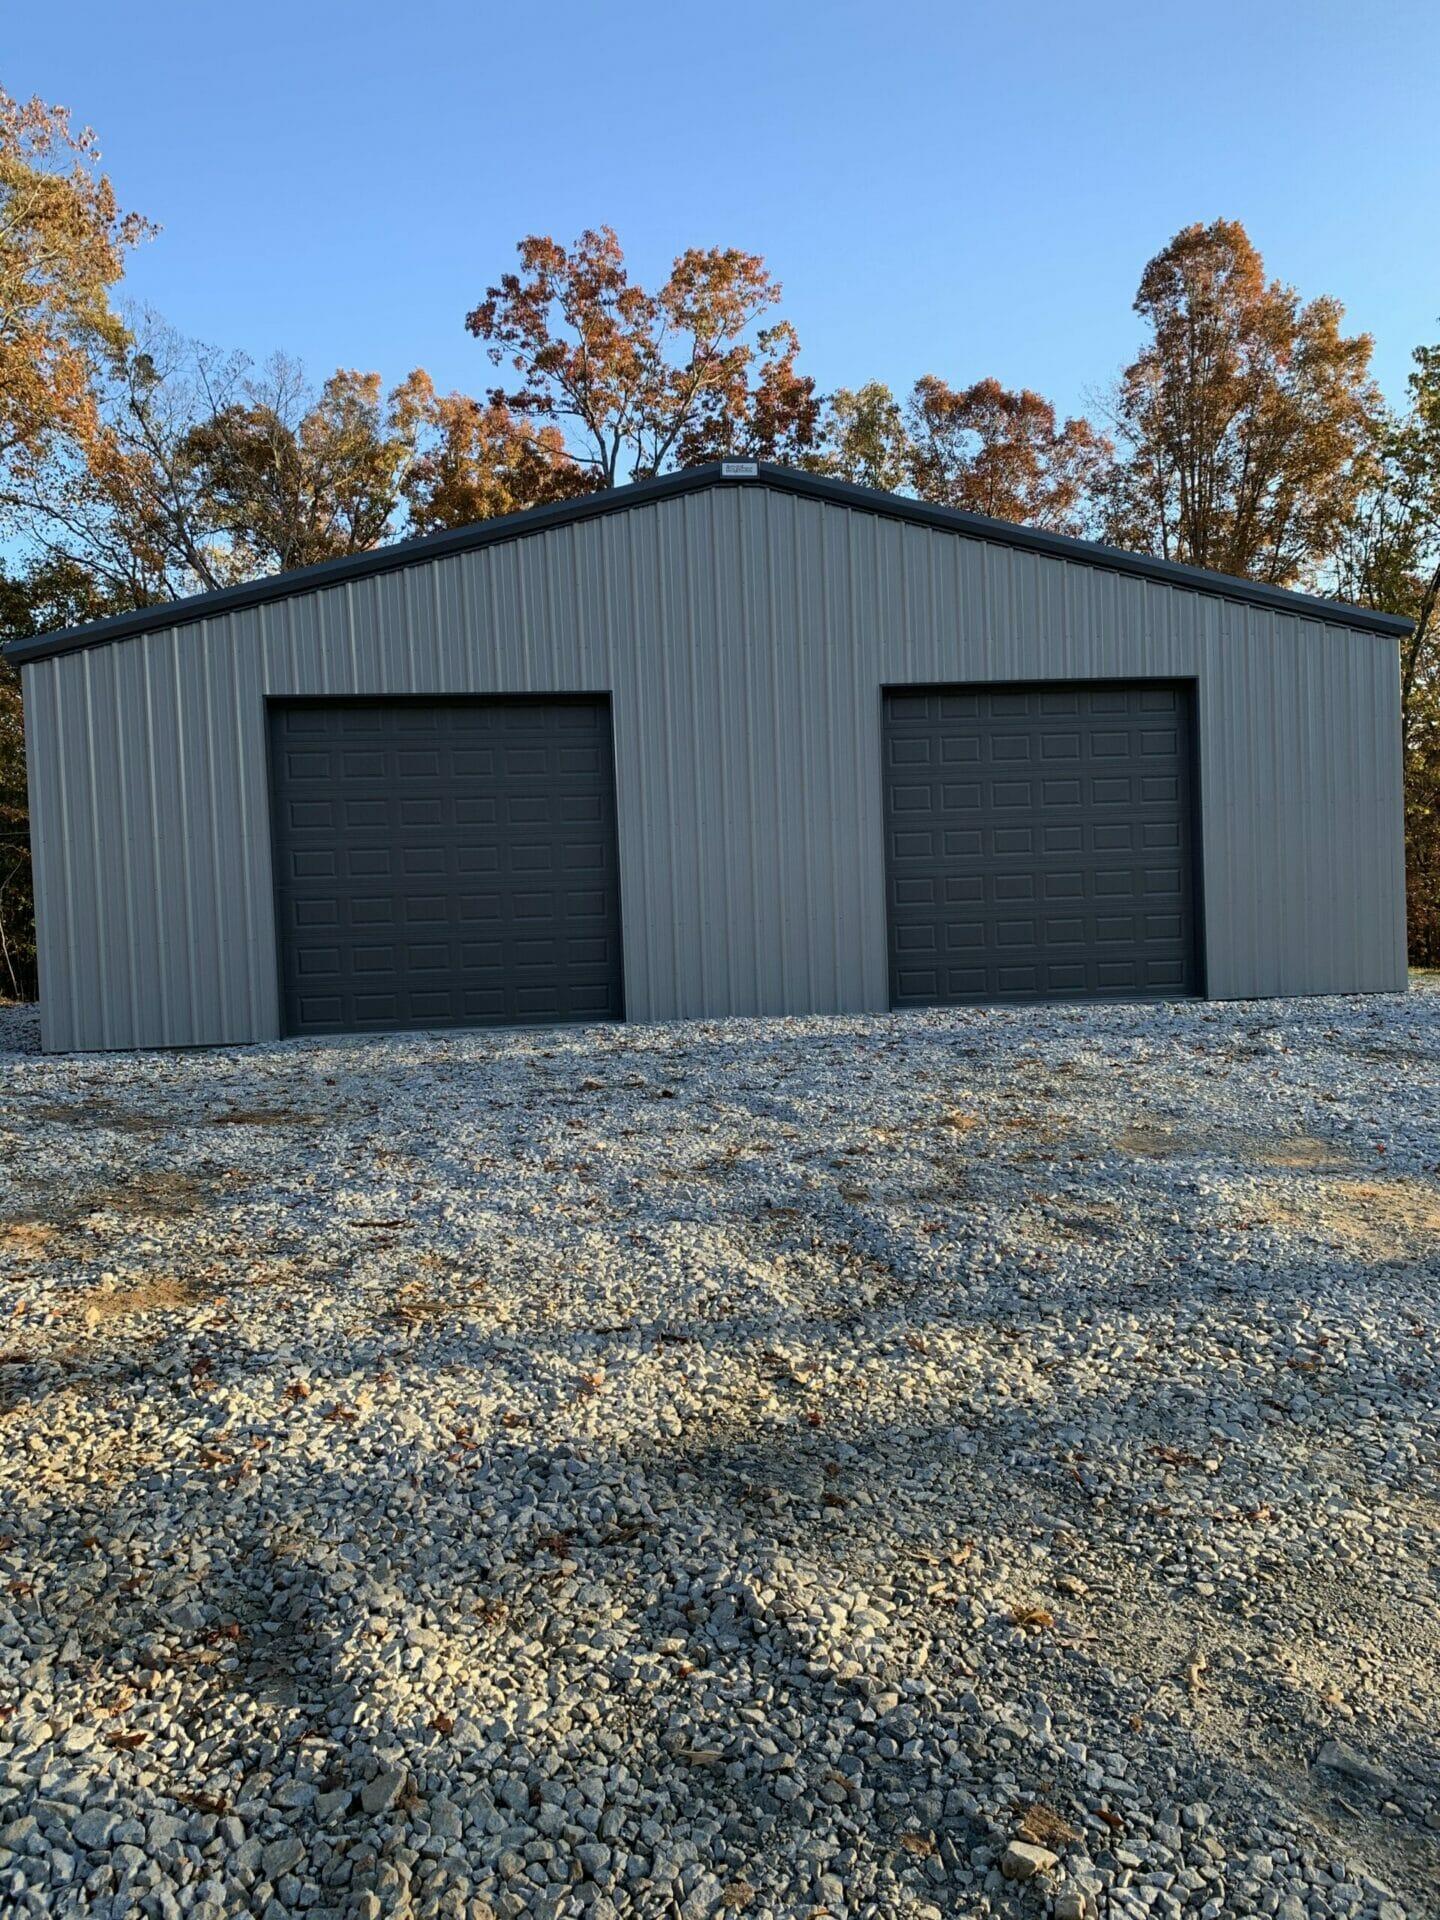 Pre-Engineered Metal 2 Car Garage Building With Roll Up Garage Doors